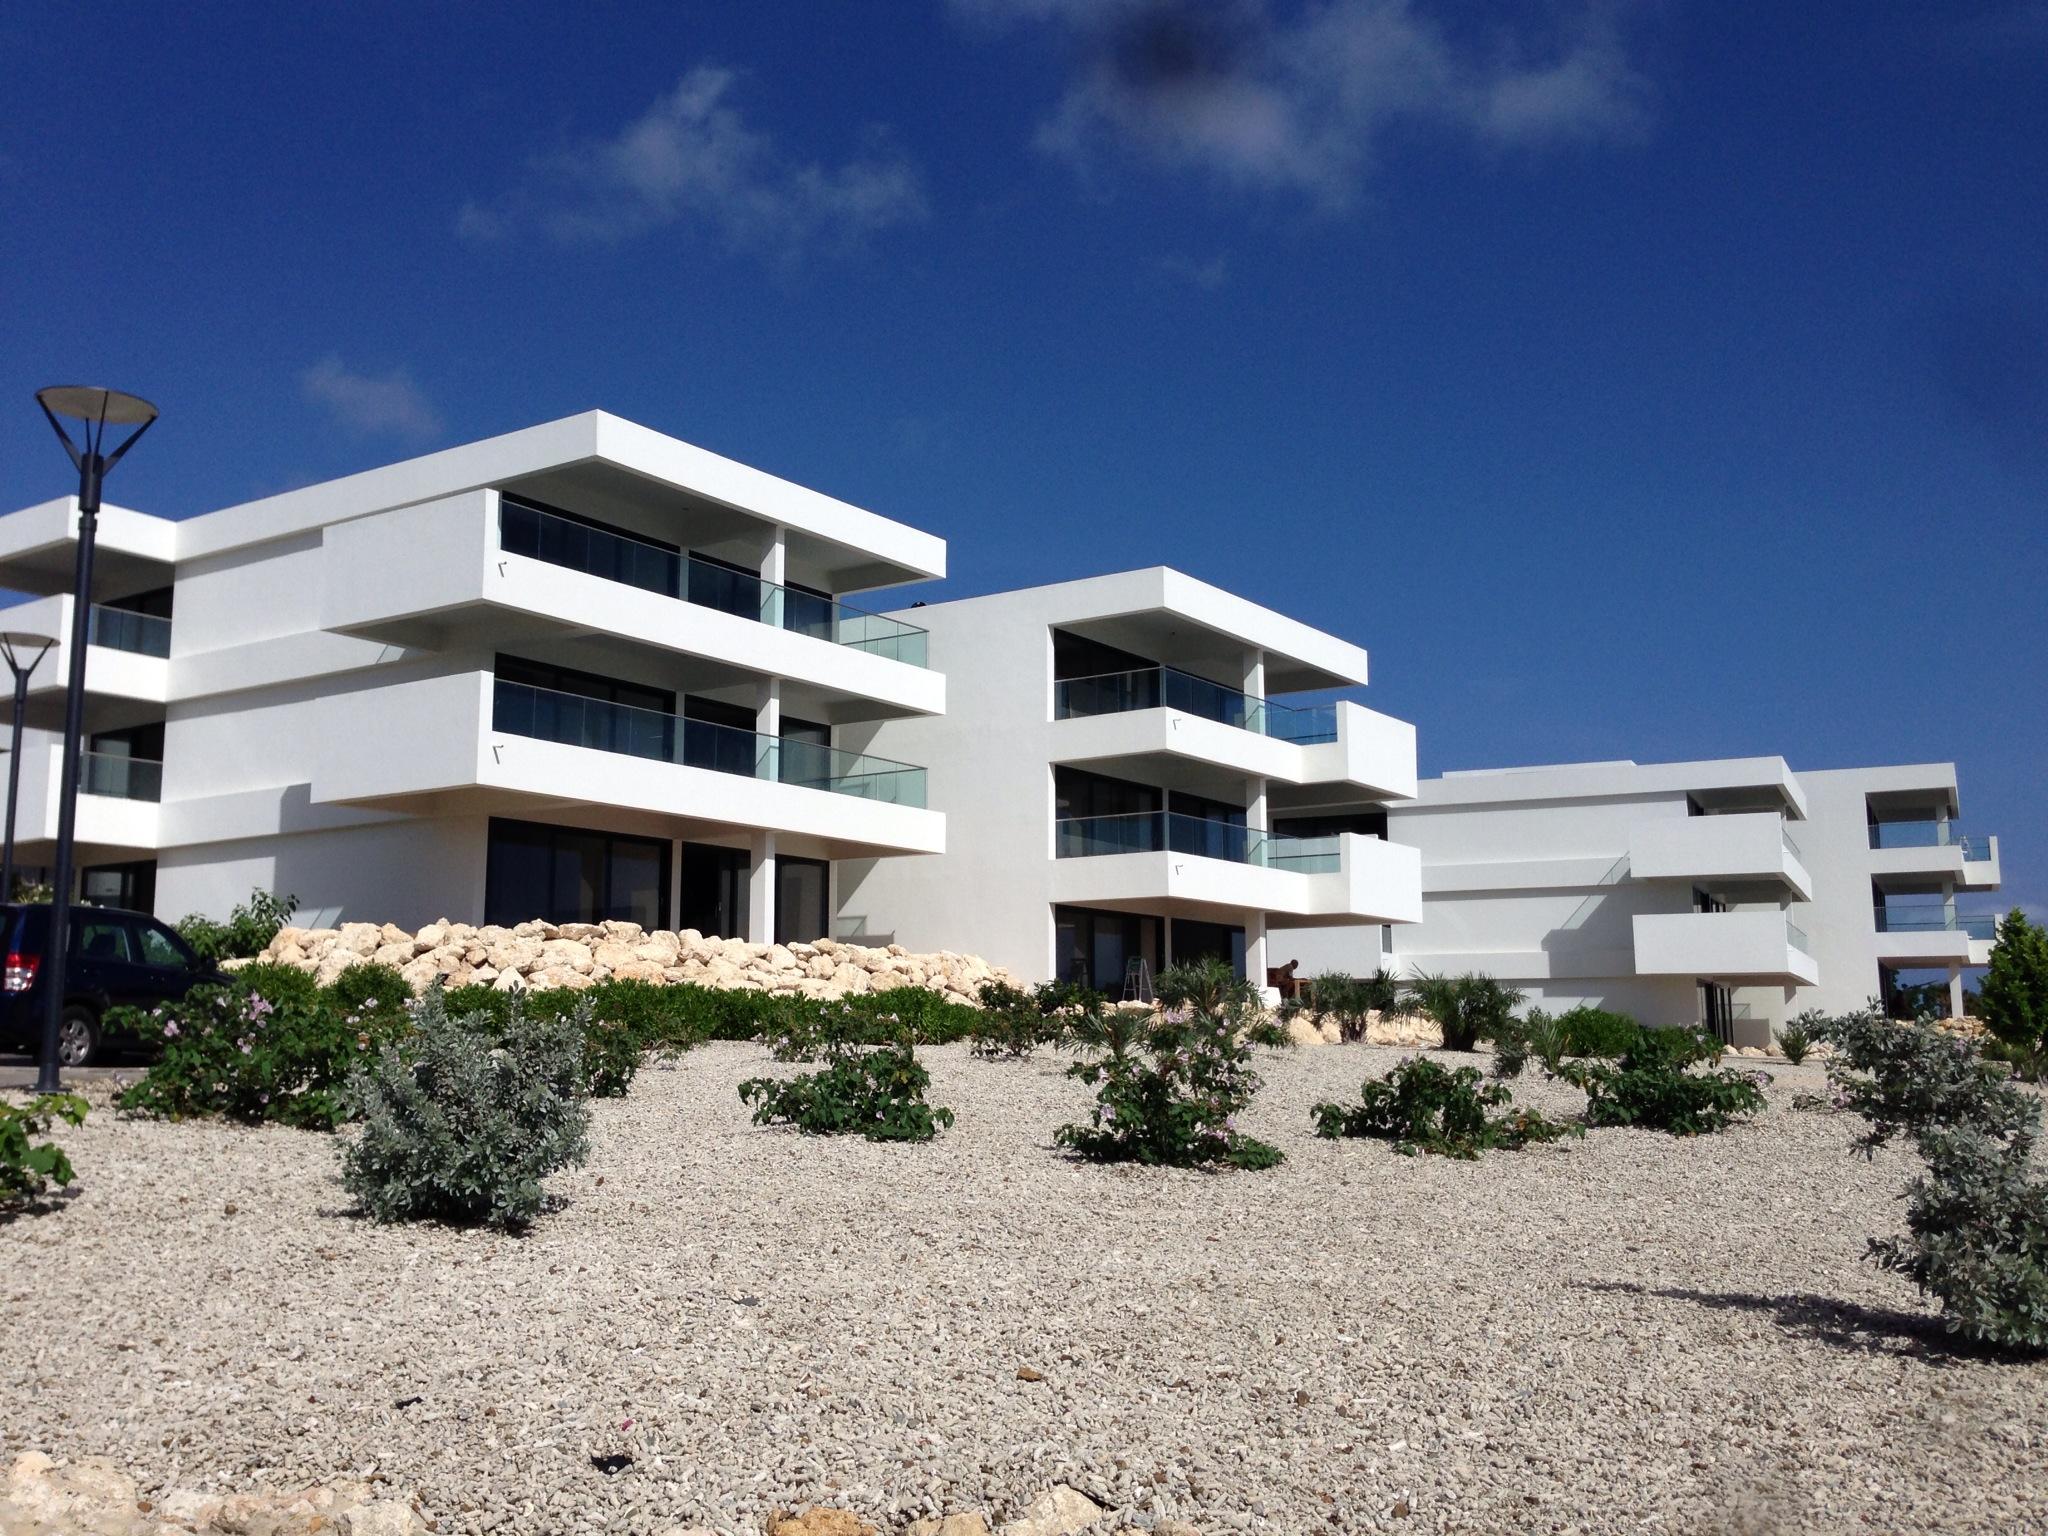 Papagayo design hotel mangasina for Designhotel norditalien